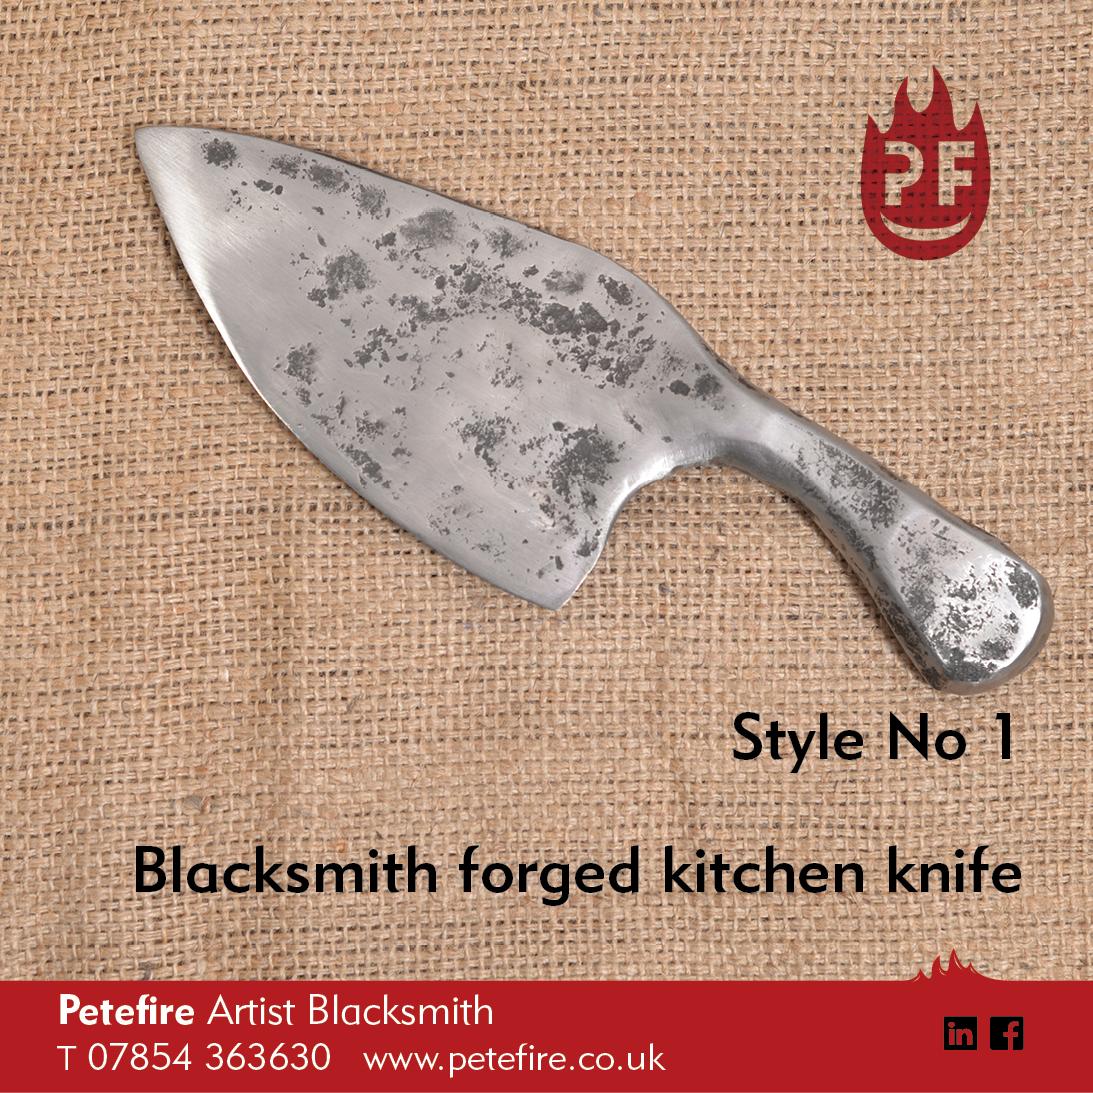 Petefire Artist Blacksmith forged kitchen knife